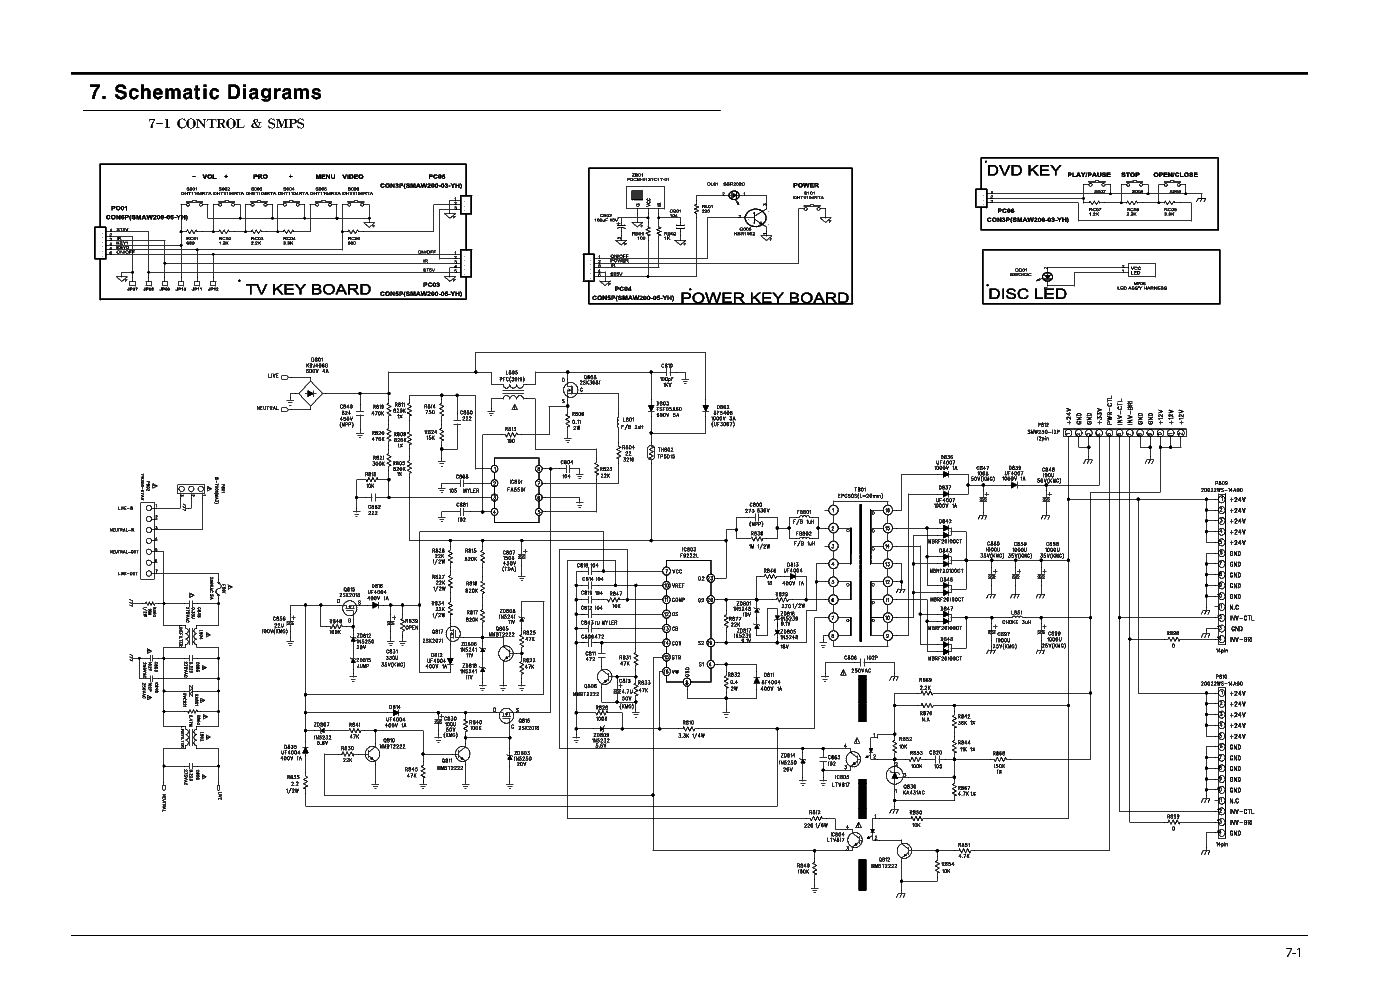 Viewsonic Power Supply Diagram - House Wiring Diagram Symbols •